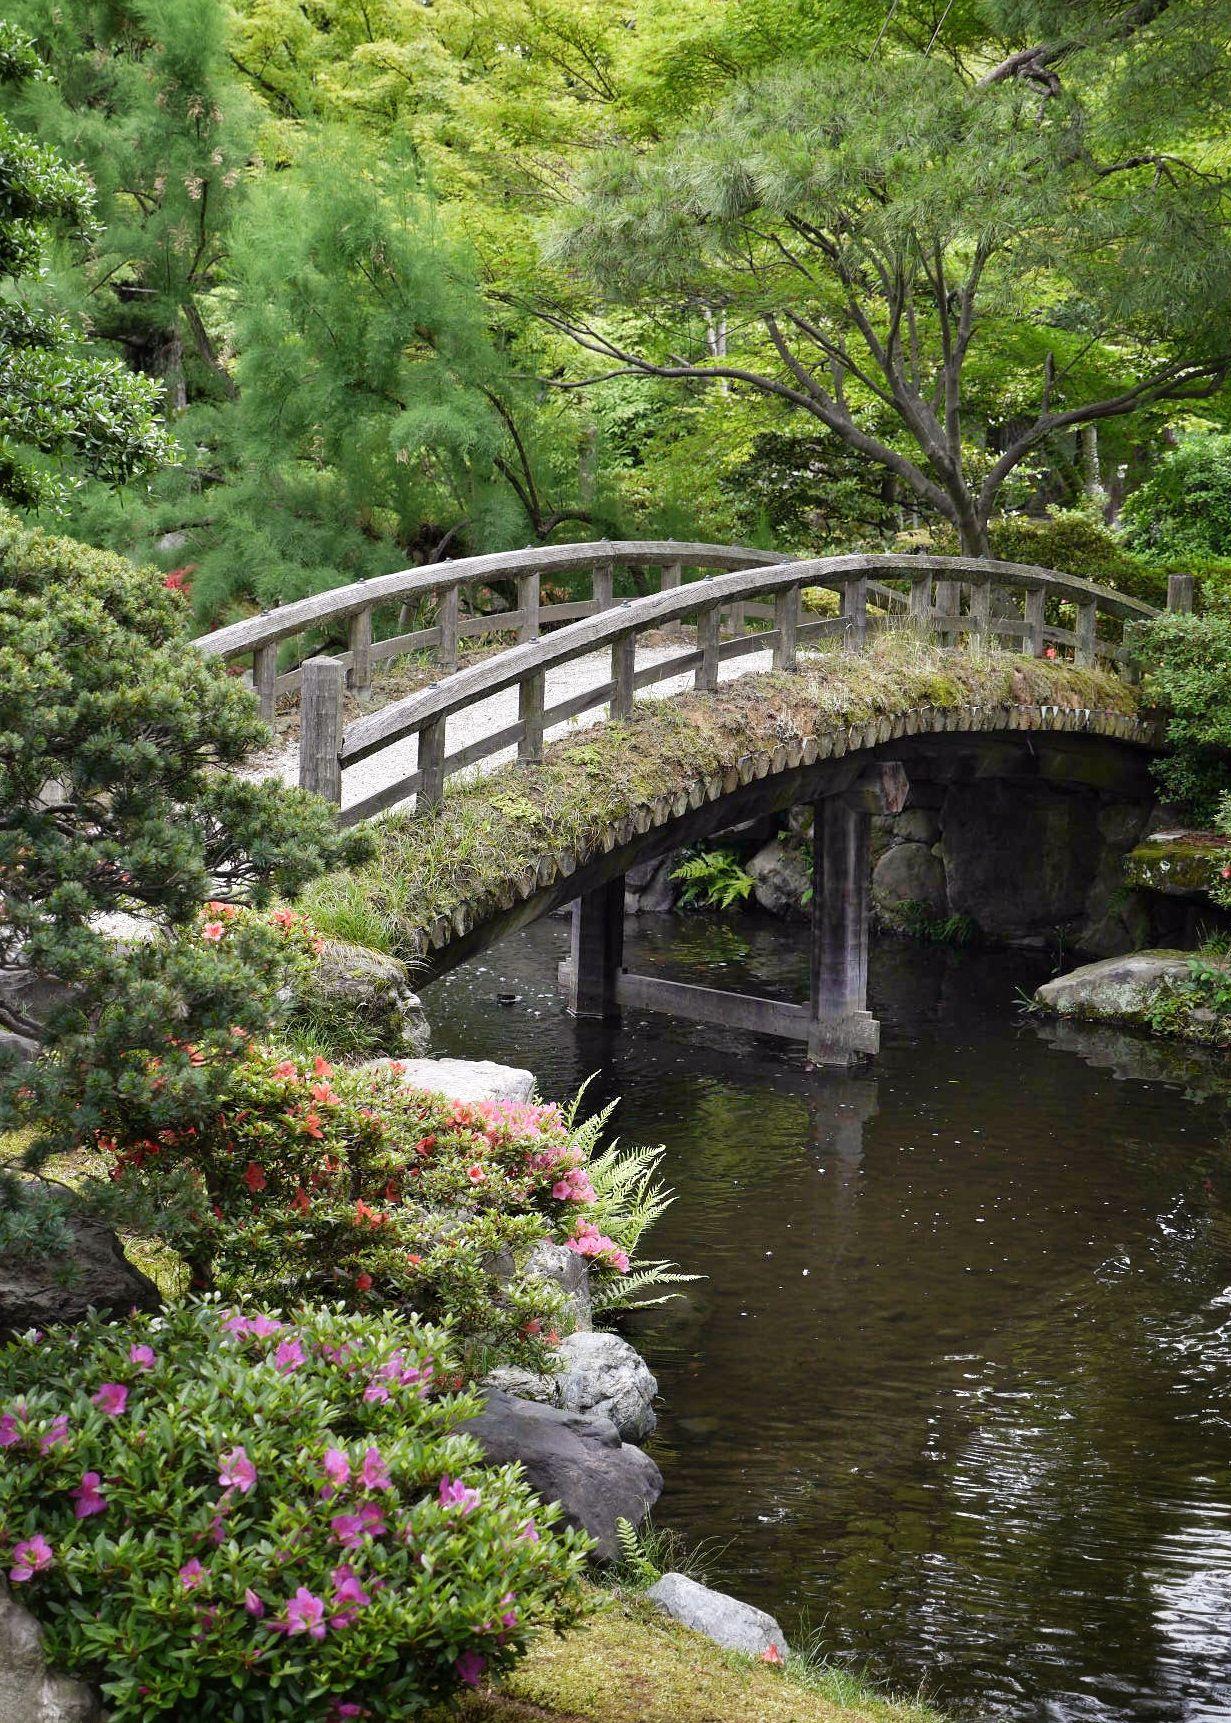 Japanese Style Garden Bridges Kyoto Imperial Palace Garden Bruggen Pinterest Palace Garden